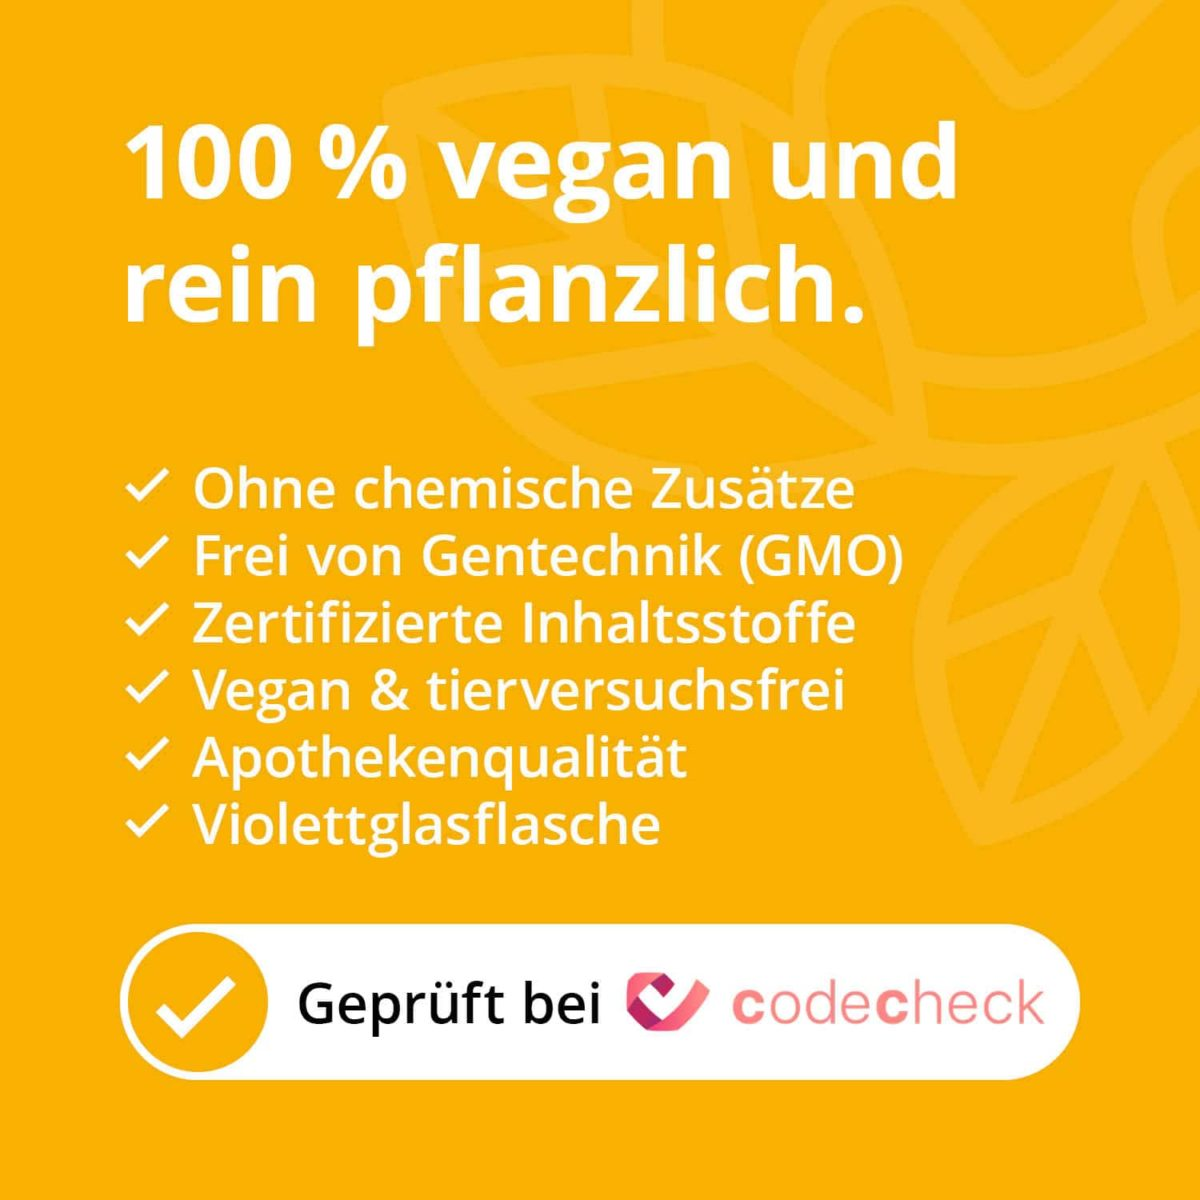 Casida Washing Lotion Repair & Protect 200 ml 13168379 PZN Apotheke Nagelpilz Fußpilz5